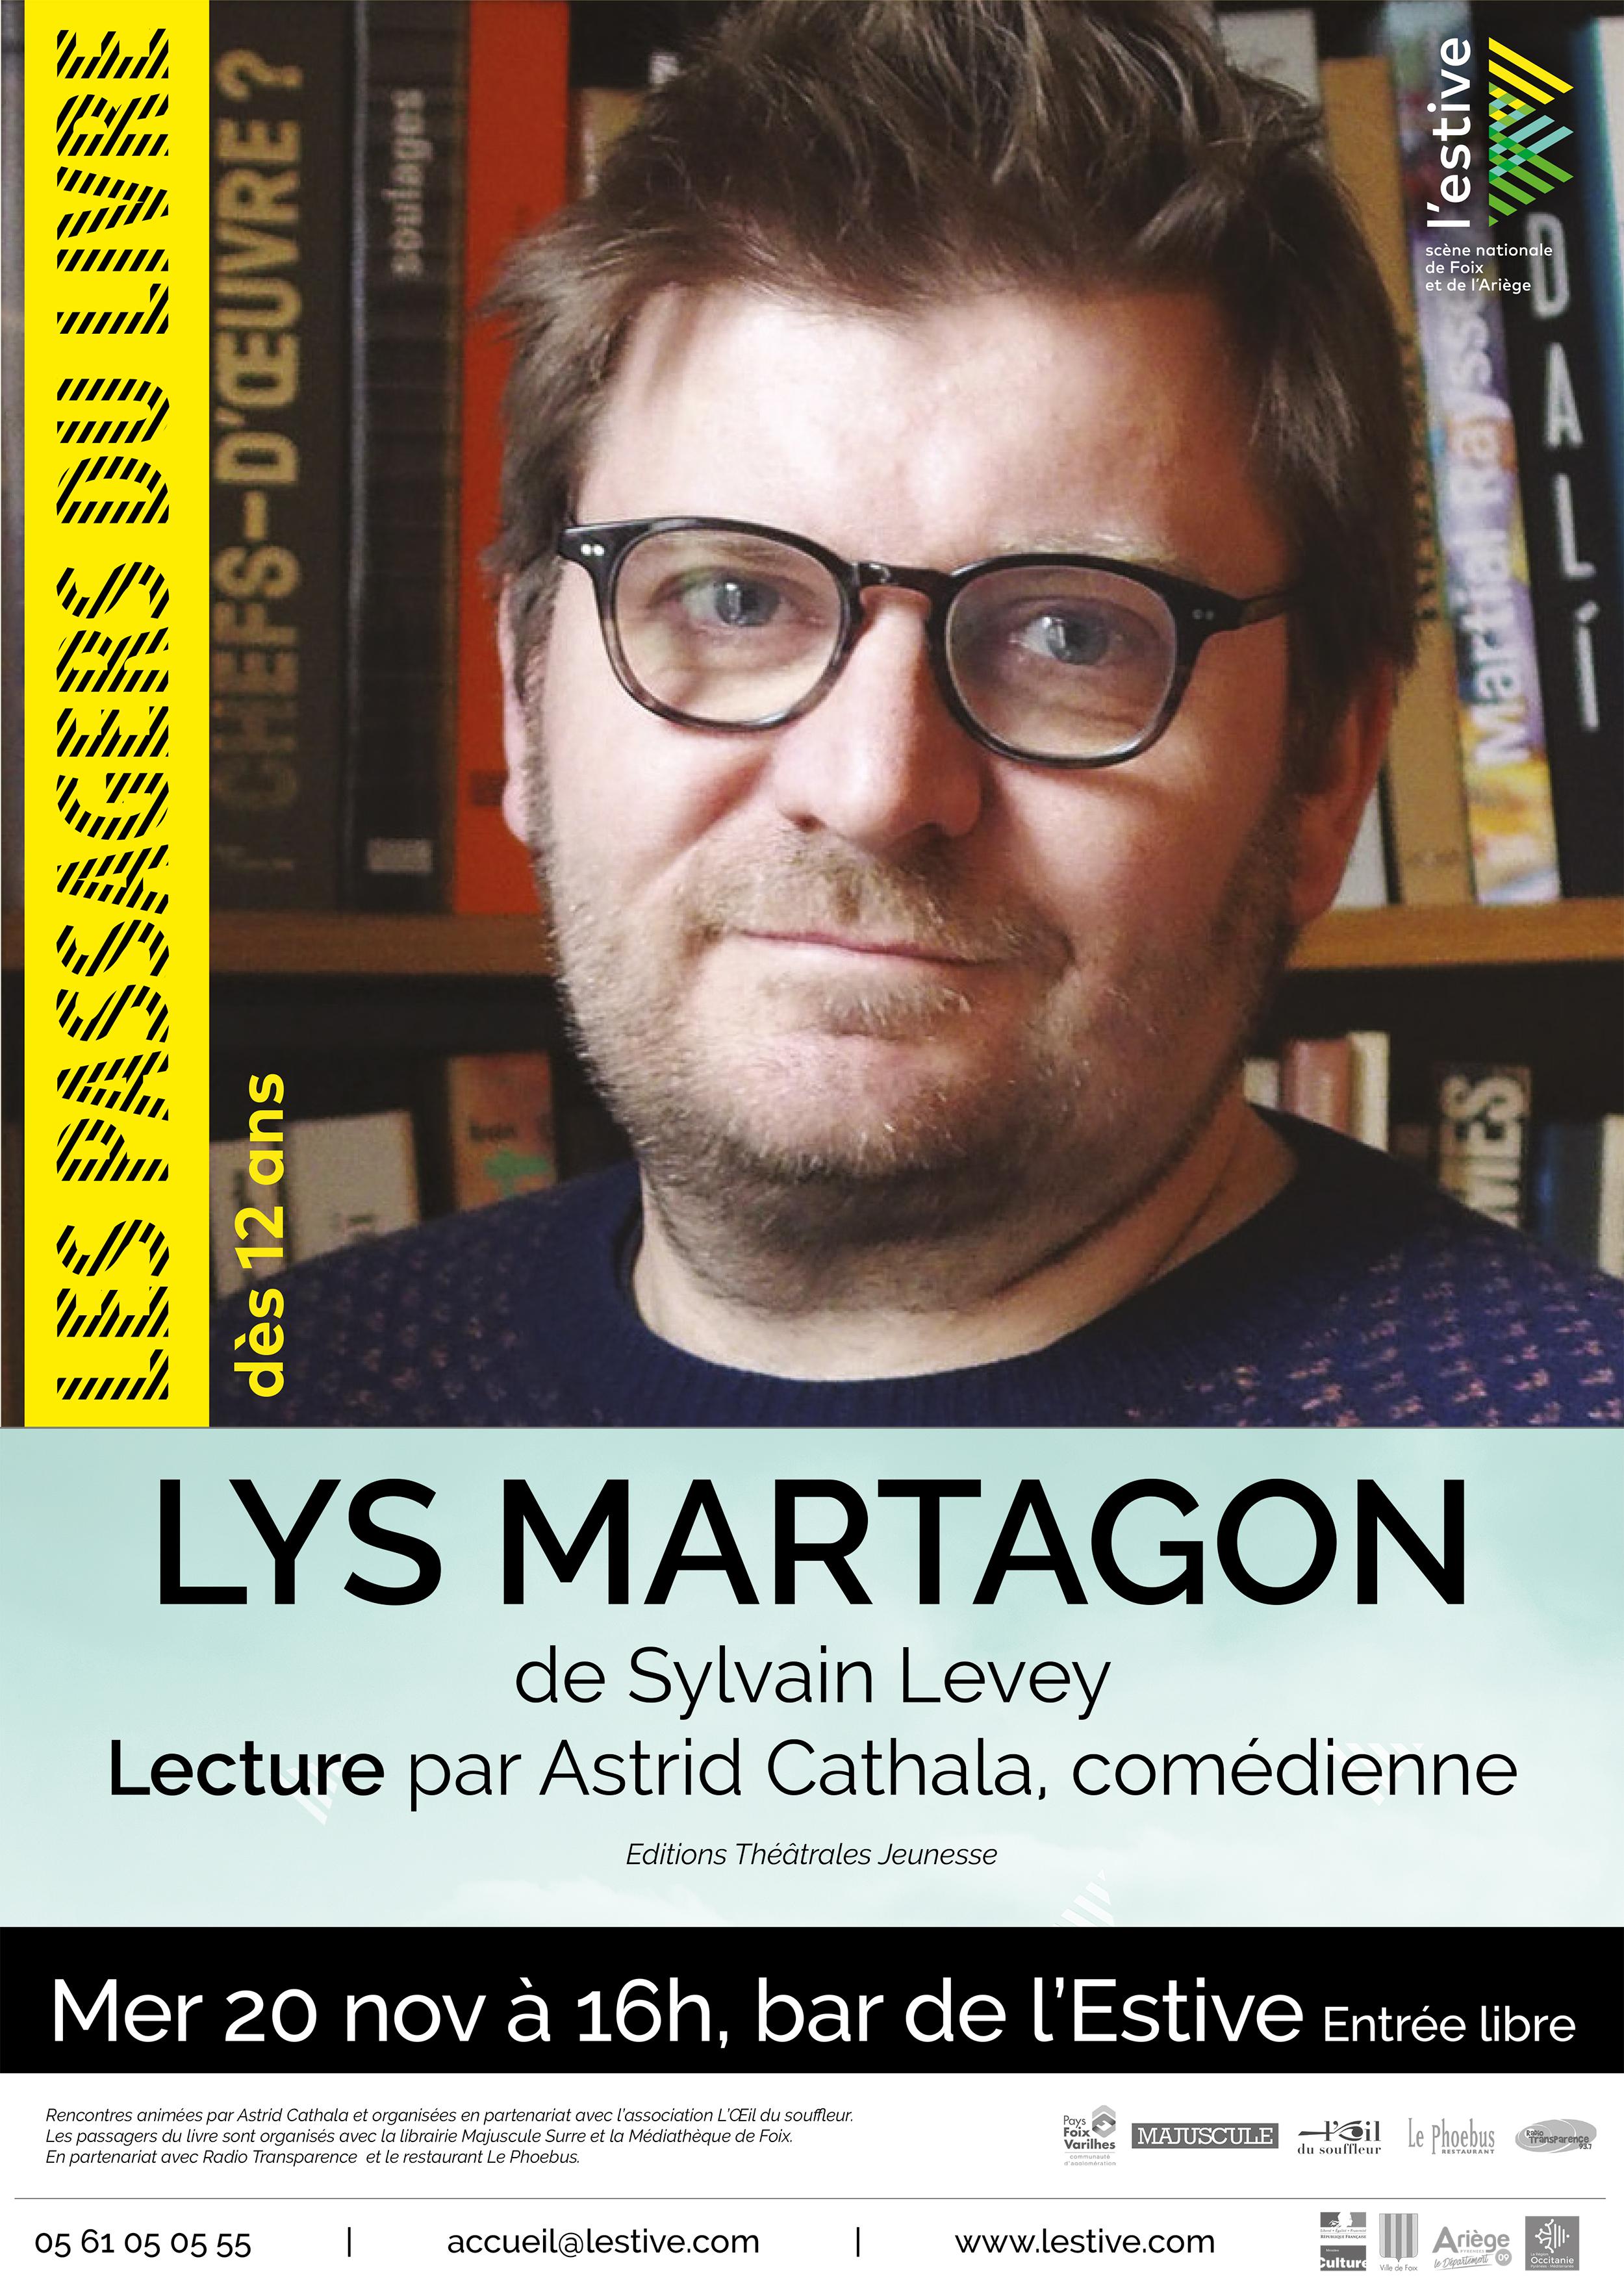 lysmartagon/pdl